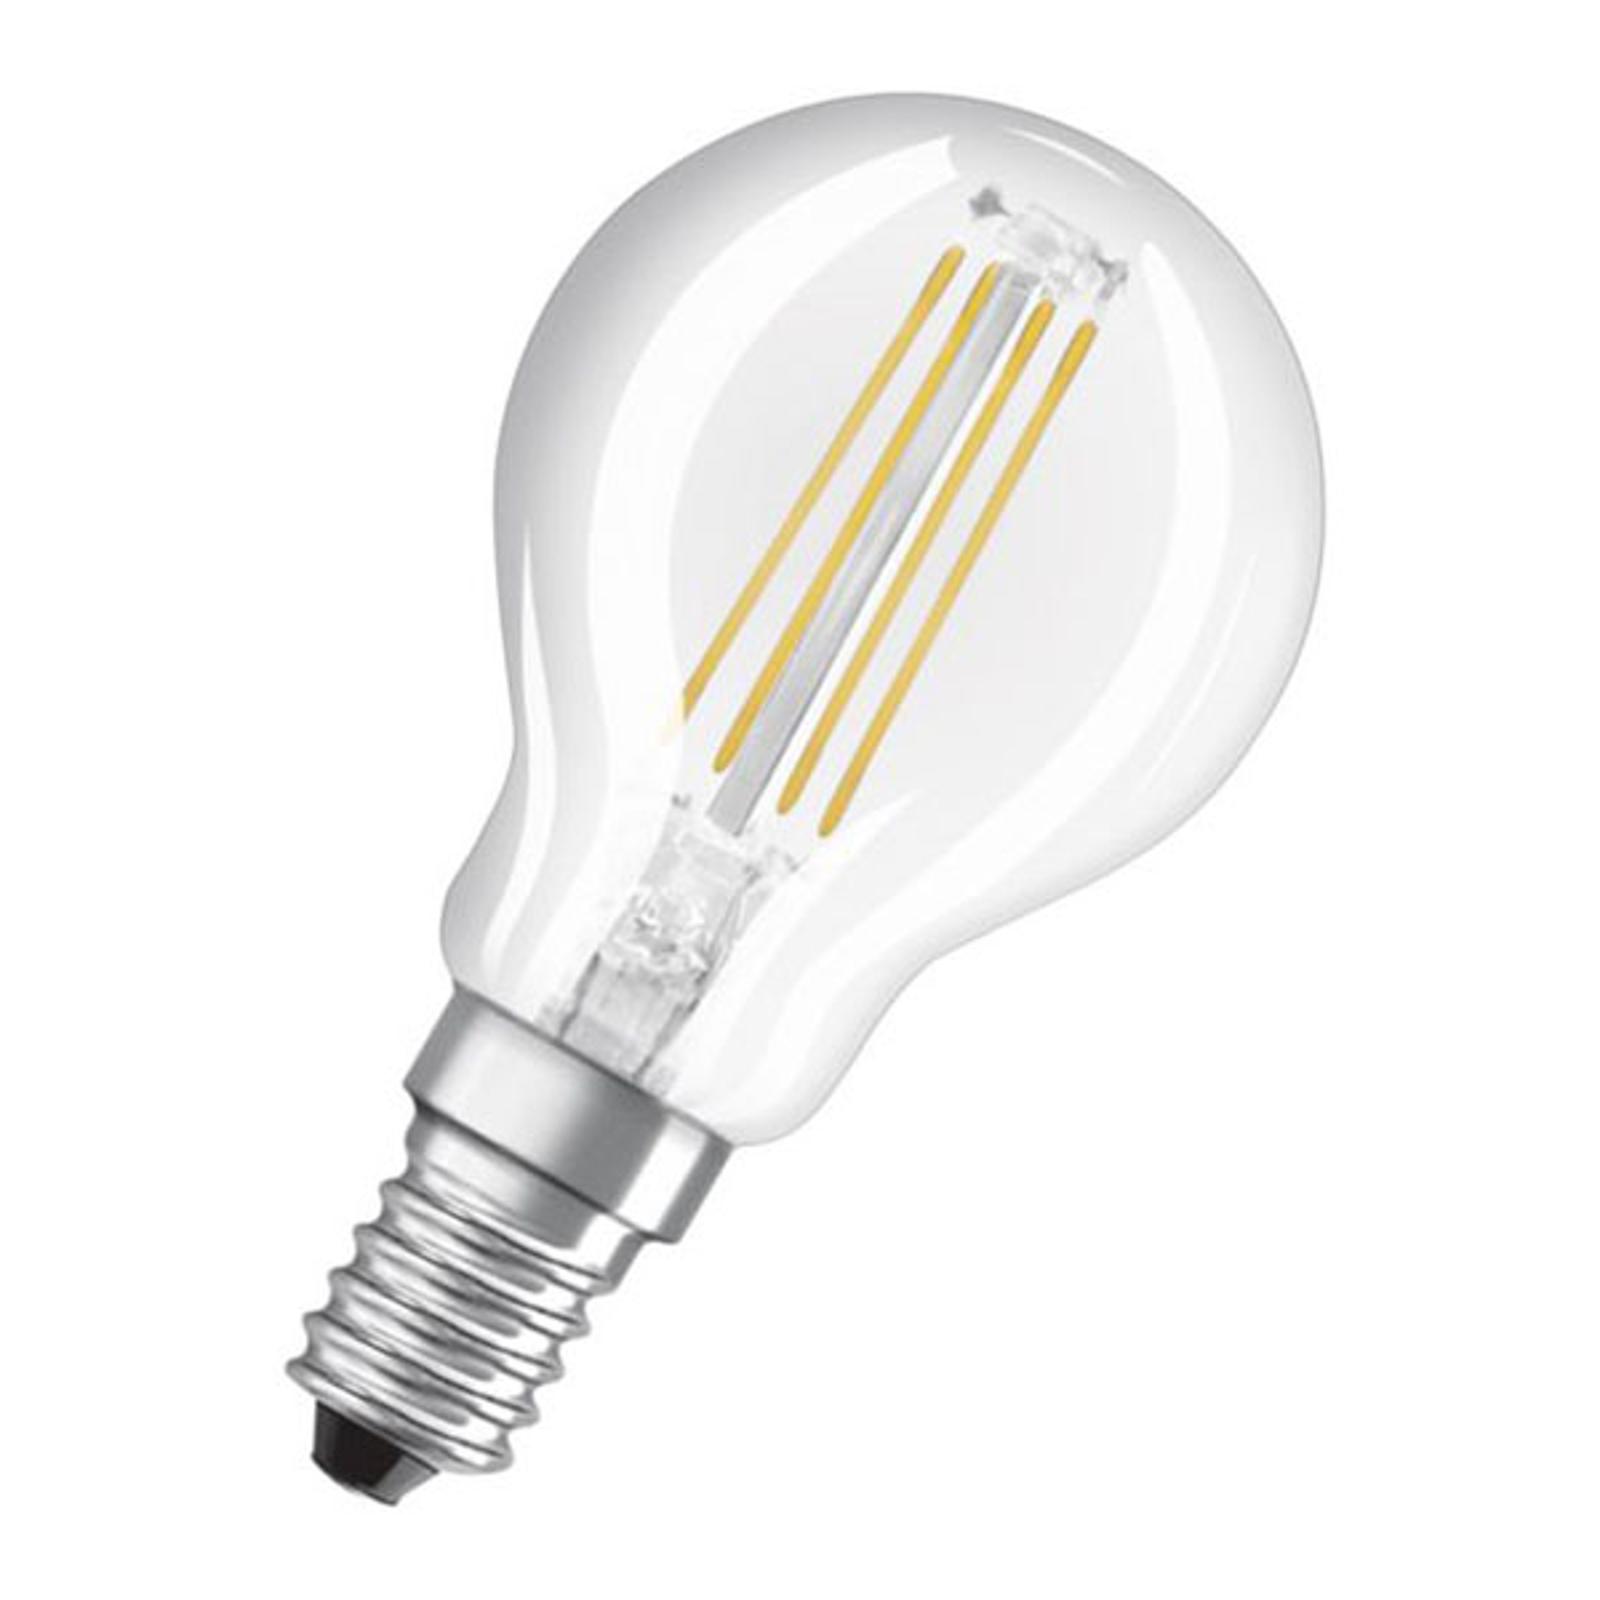 OSRAM Classic P LED-lampa E14 4 W 2700K 2-pack